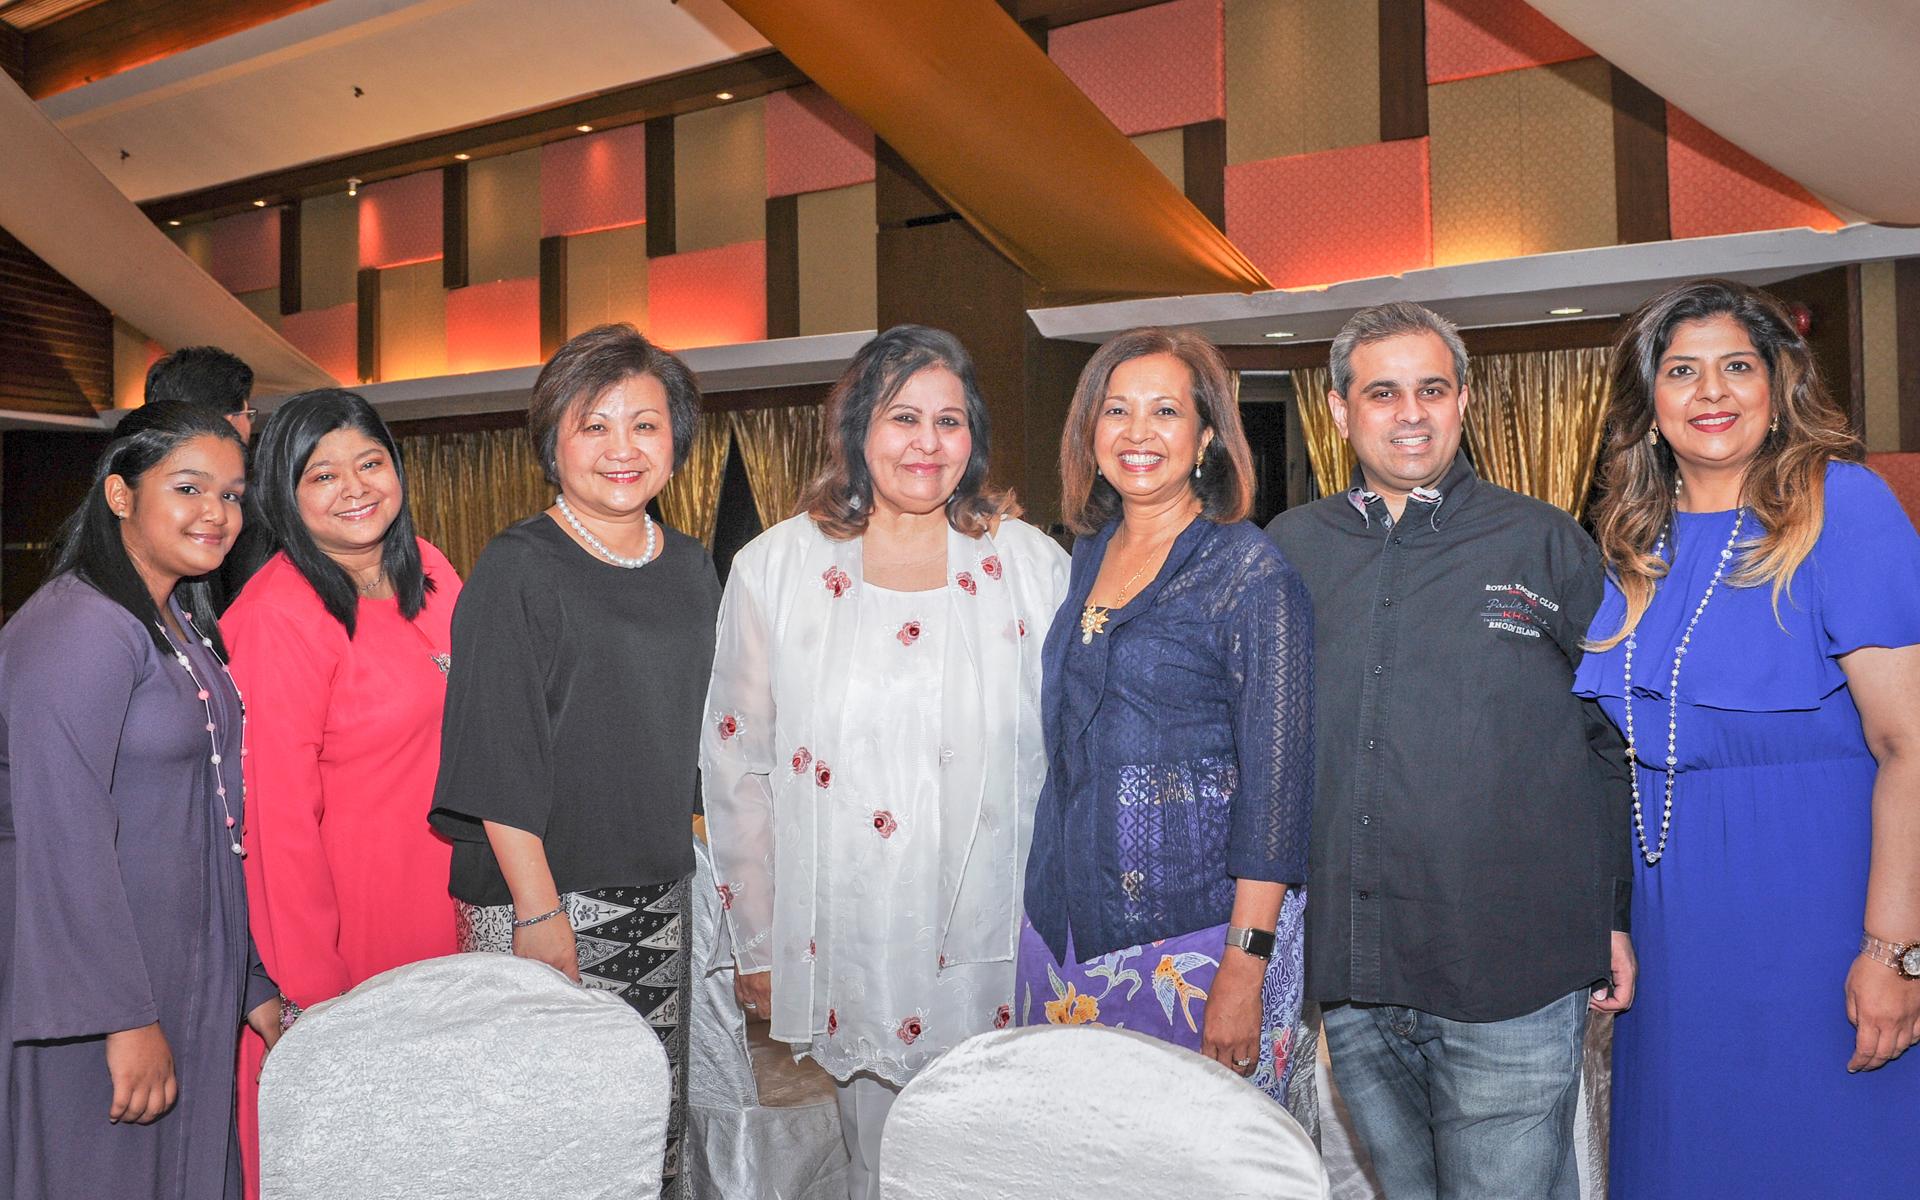 Sarah Safian, Azlina Safian, Datin Amy Ooi, Datin Champa Valiram, Datin Paduka Marina Mahathir, Sharan Valiram and Lavina Valiram